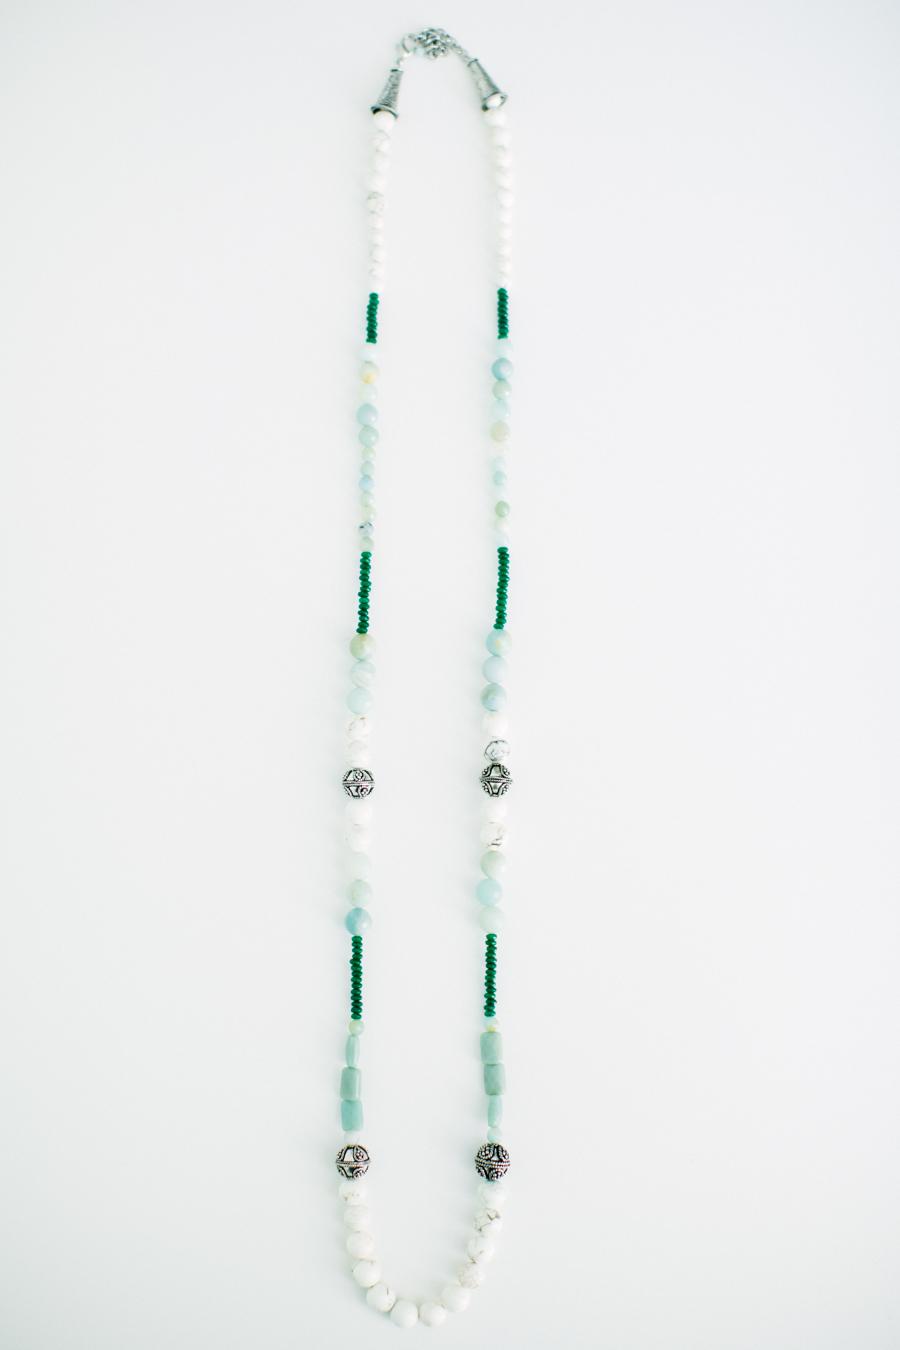 Jewelry-MackenzieKern-8.jpg